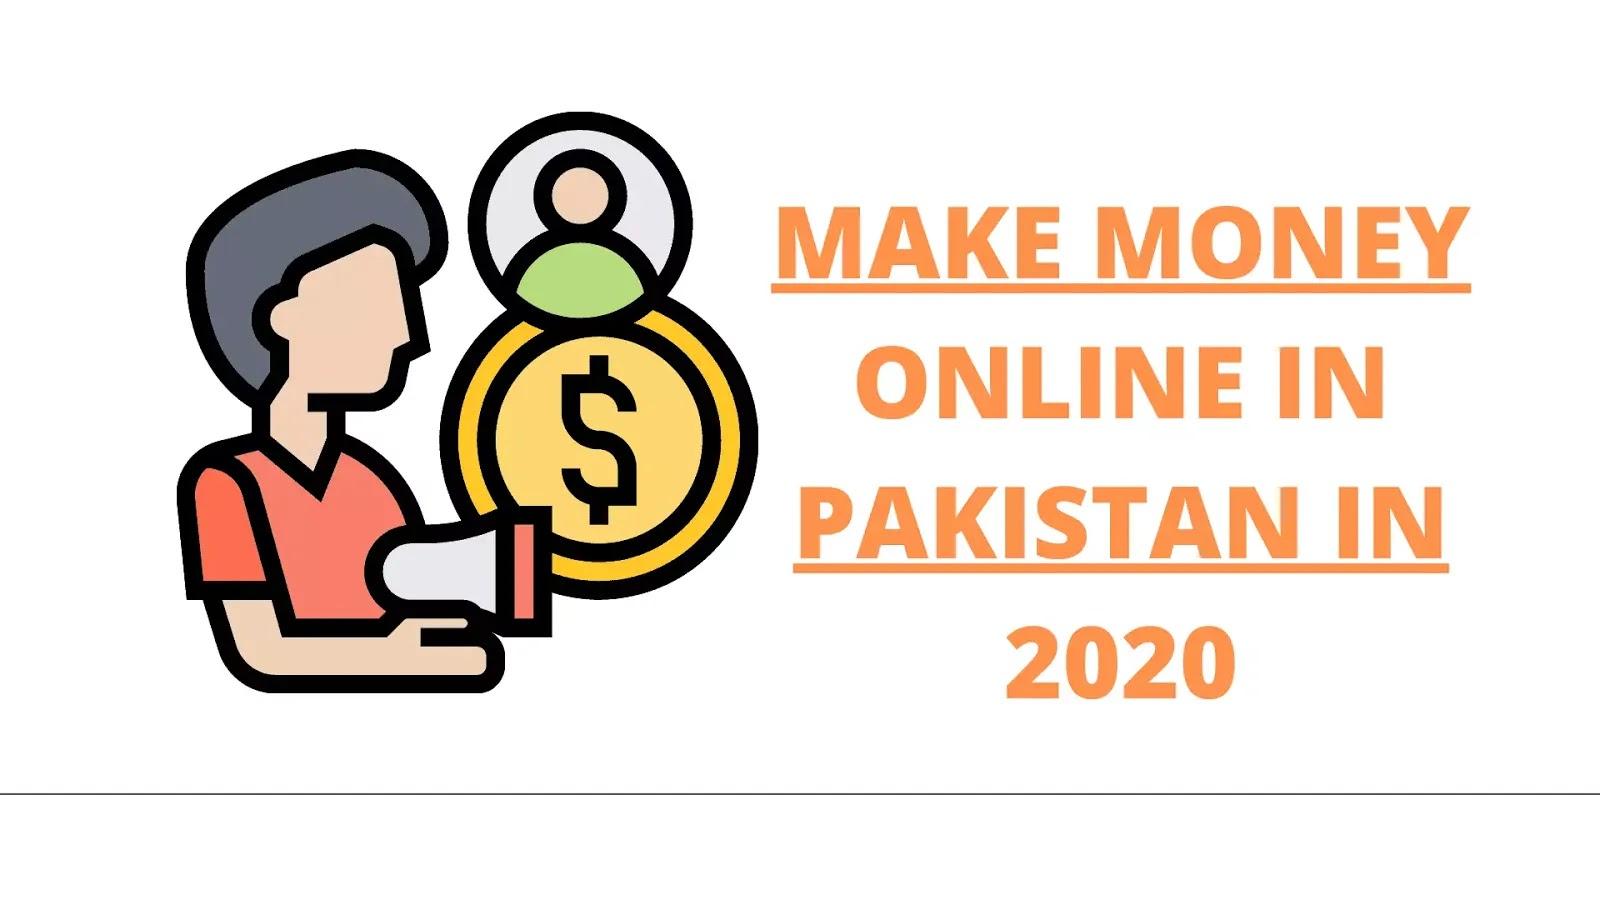 Make money online in Pakistan in 2020